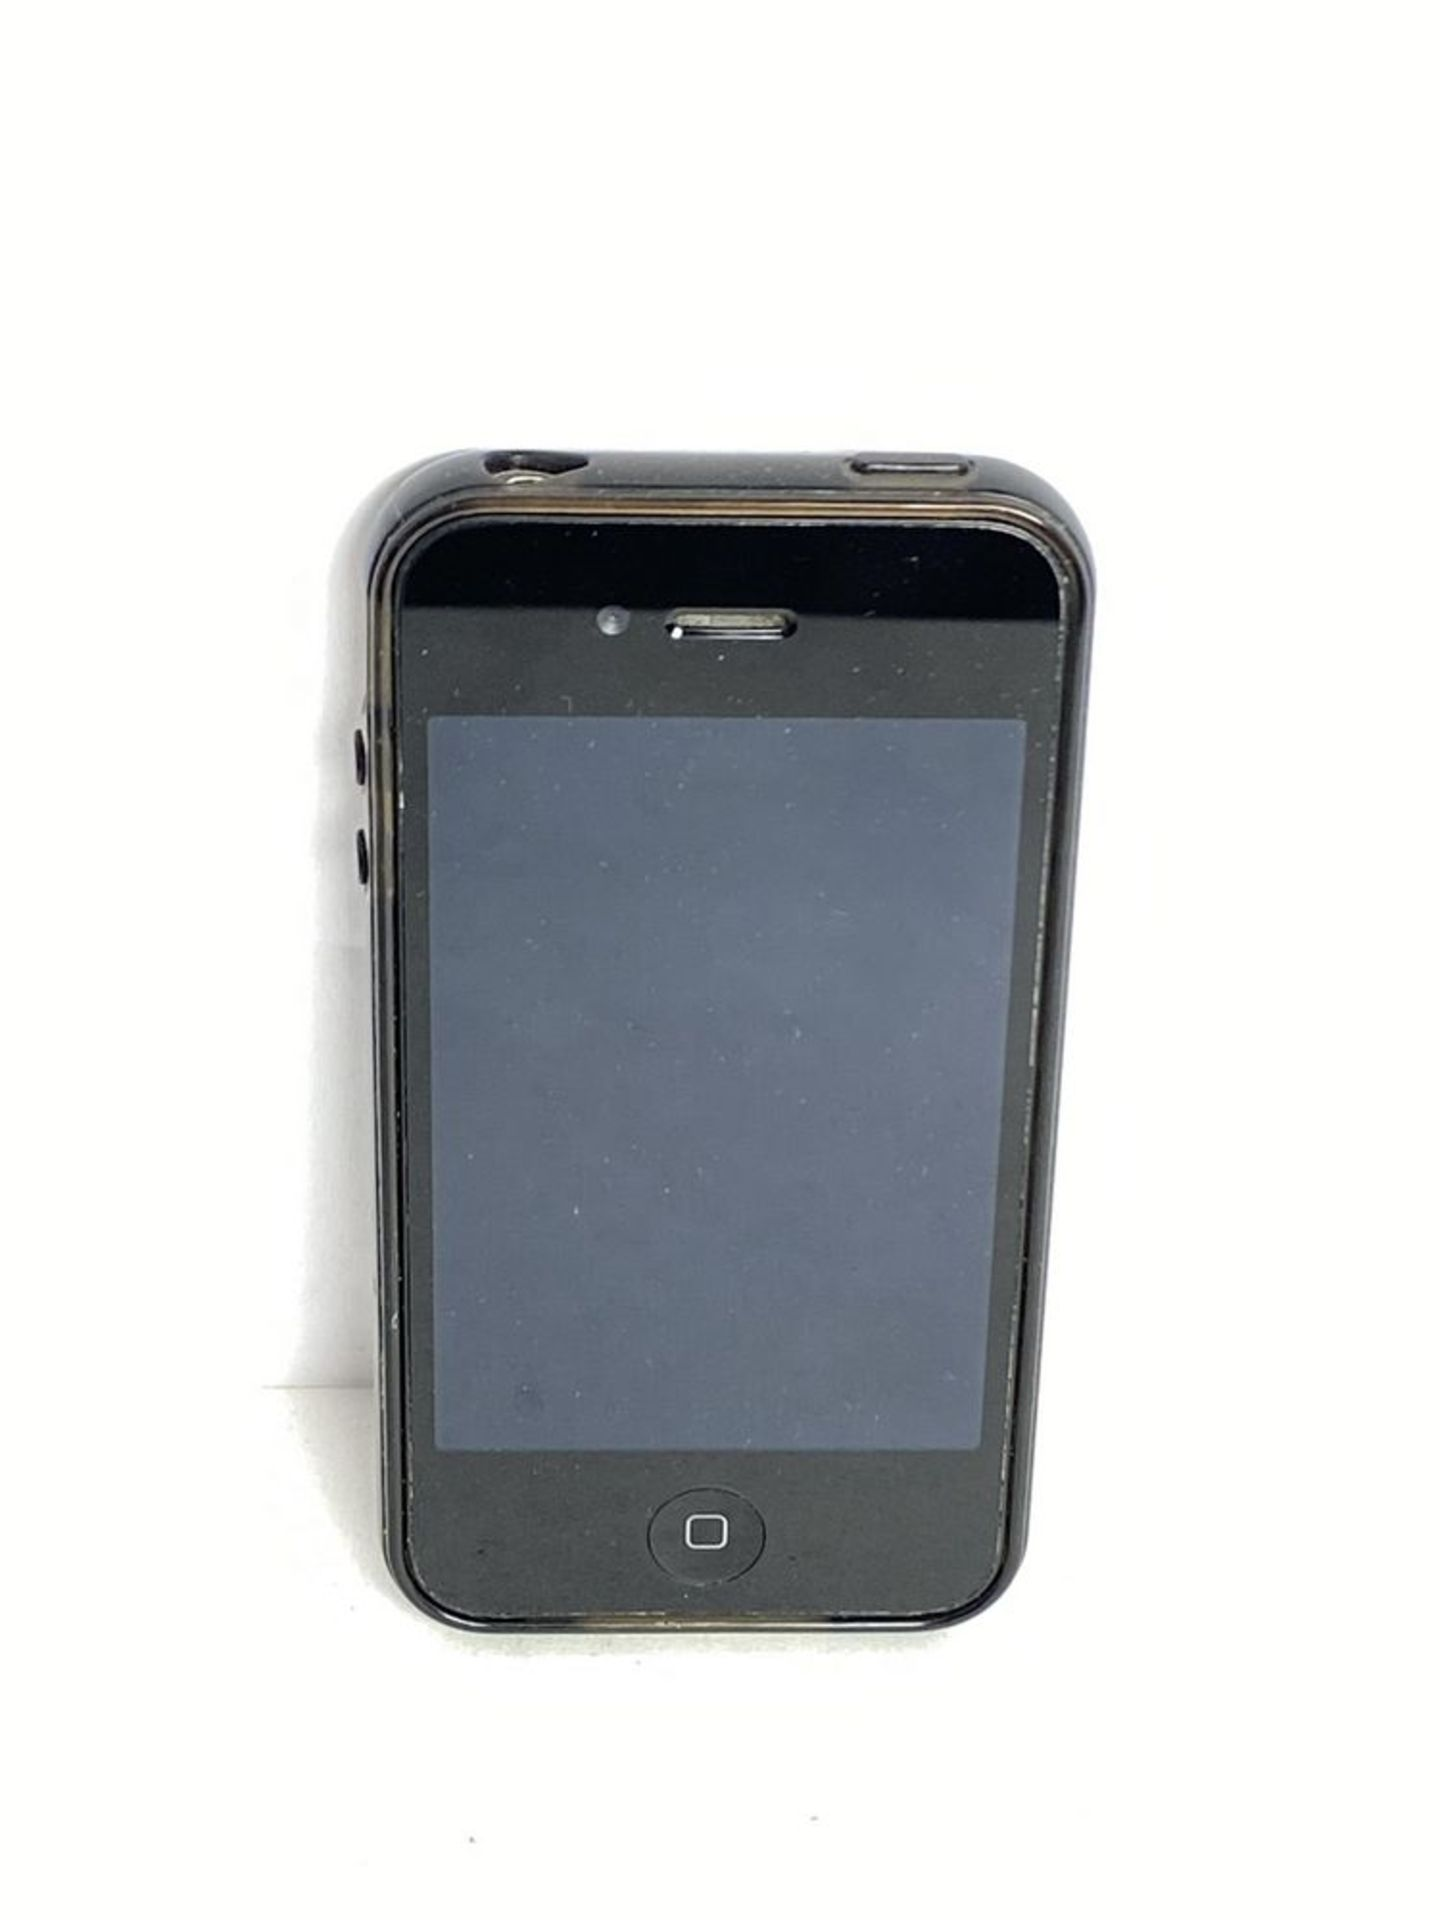 Lot 121 - Apple iPhone 4S Model A1387, Black, In Case